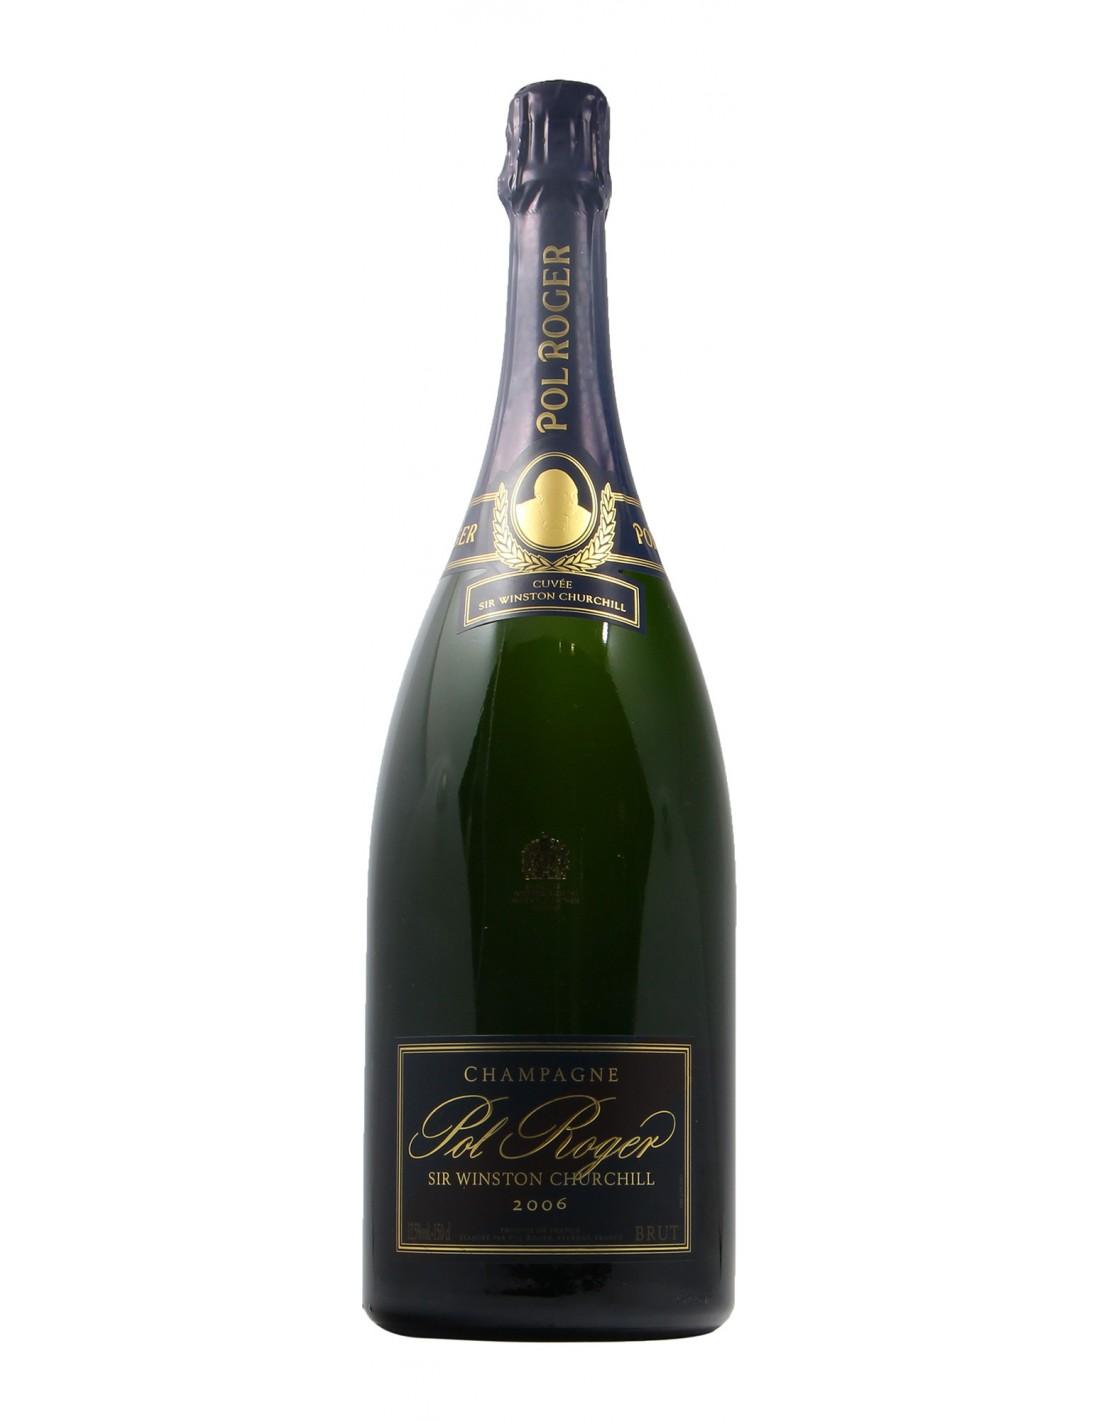 Champagne Winston Churchill Magnum 2006 POL ROGER GRANDI